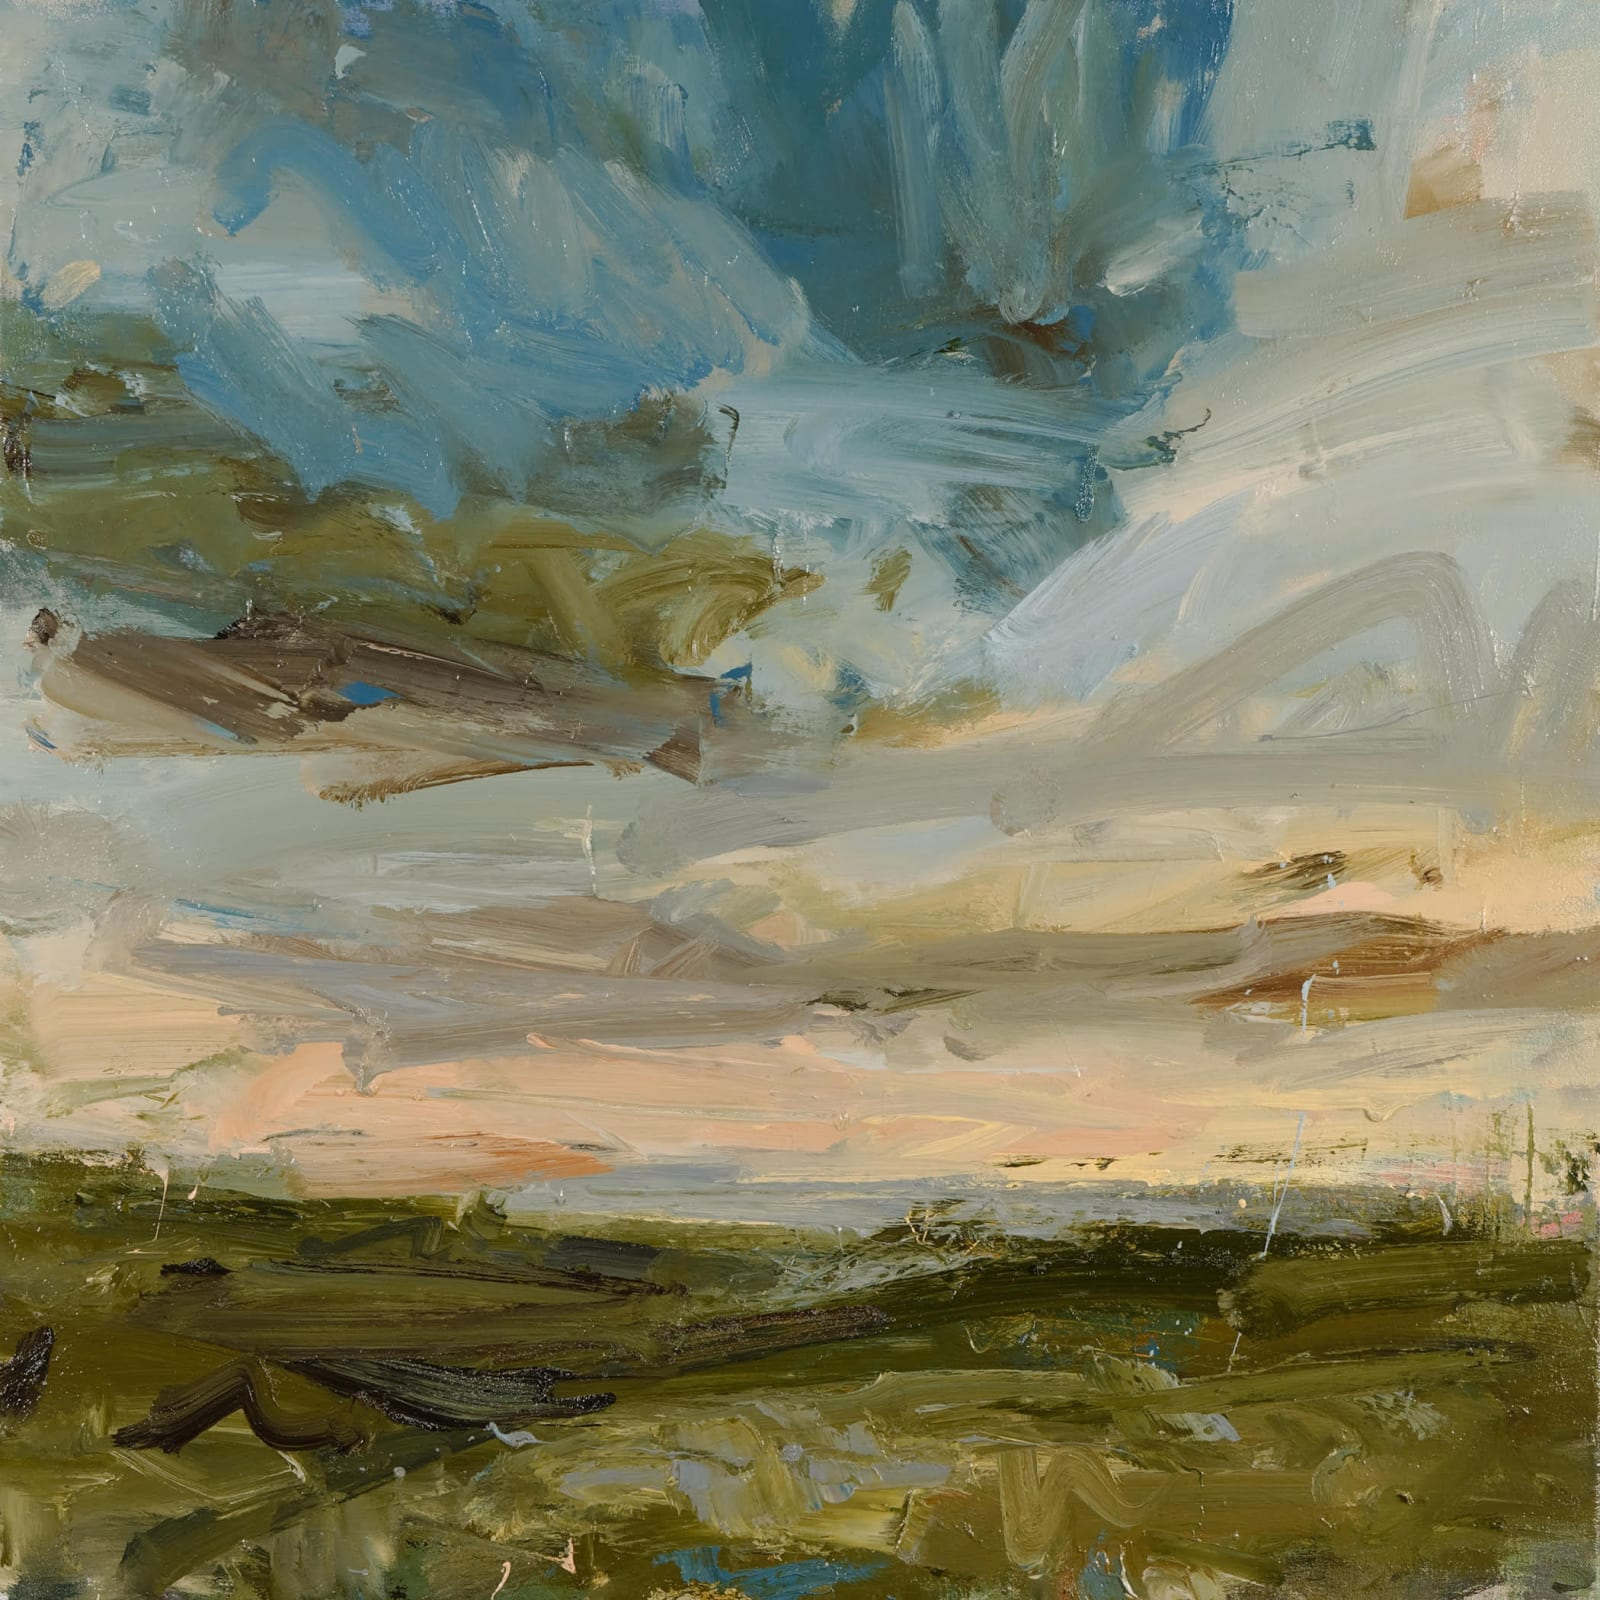 Higher Bojewyan, Peachy Sky oil on canvas 70cm x 70cm